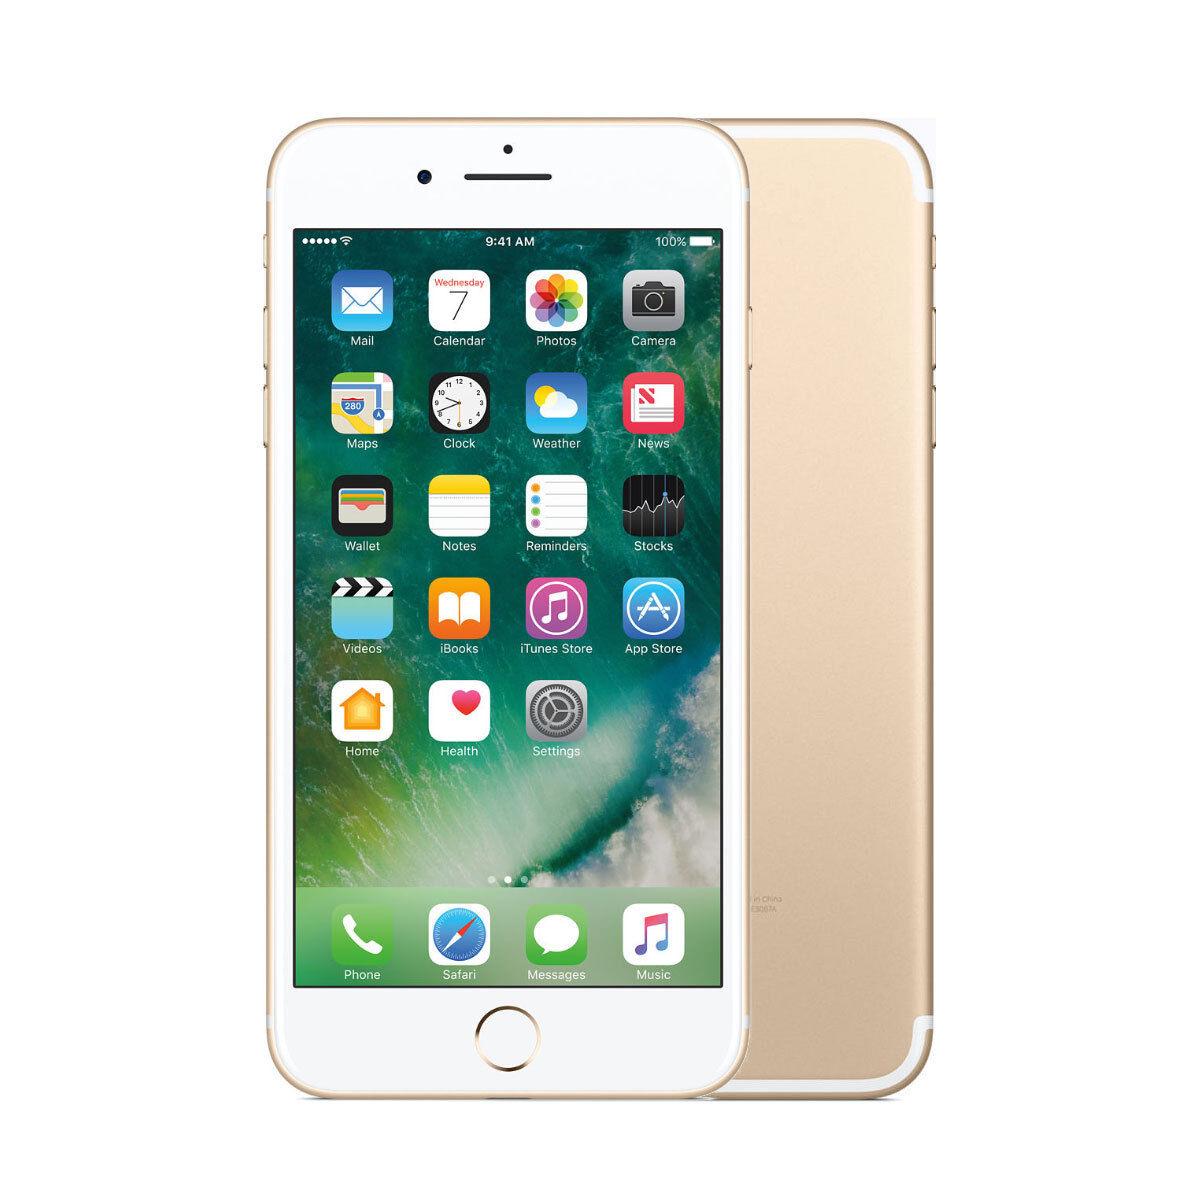 "Apple iPhone 7 ""Factory Unlocked"" 32GB 4G LTE iOS WiFi Smartphone"